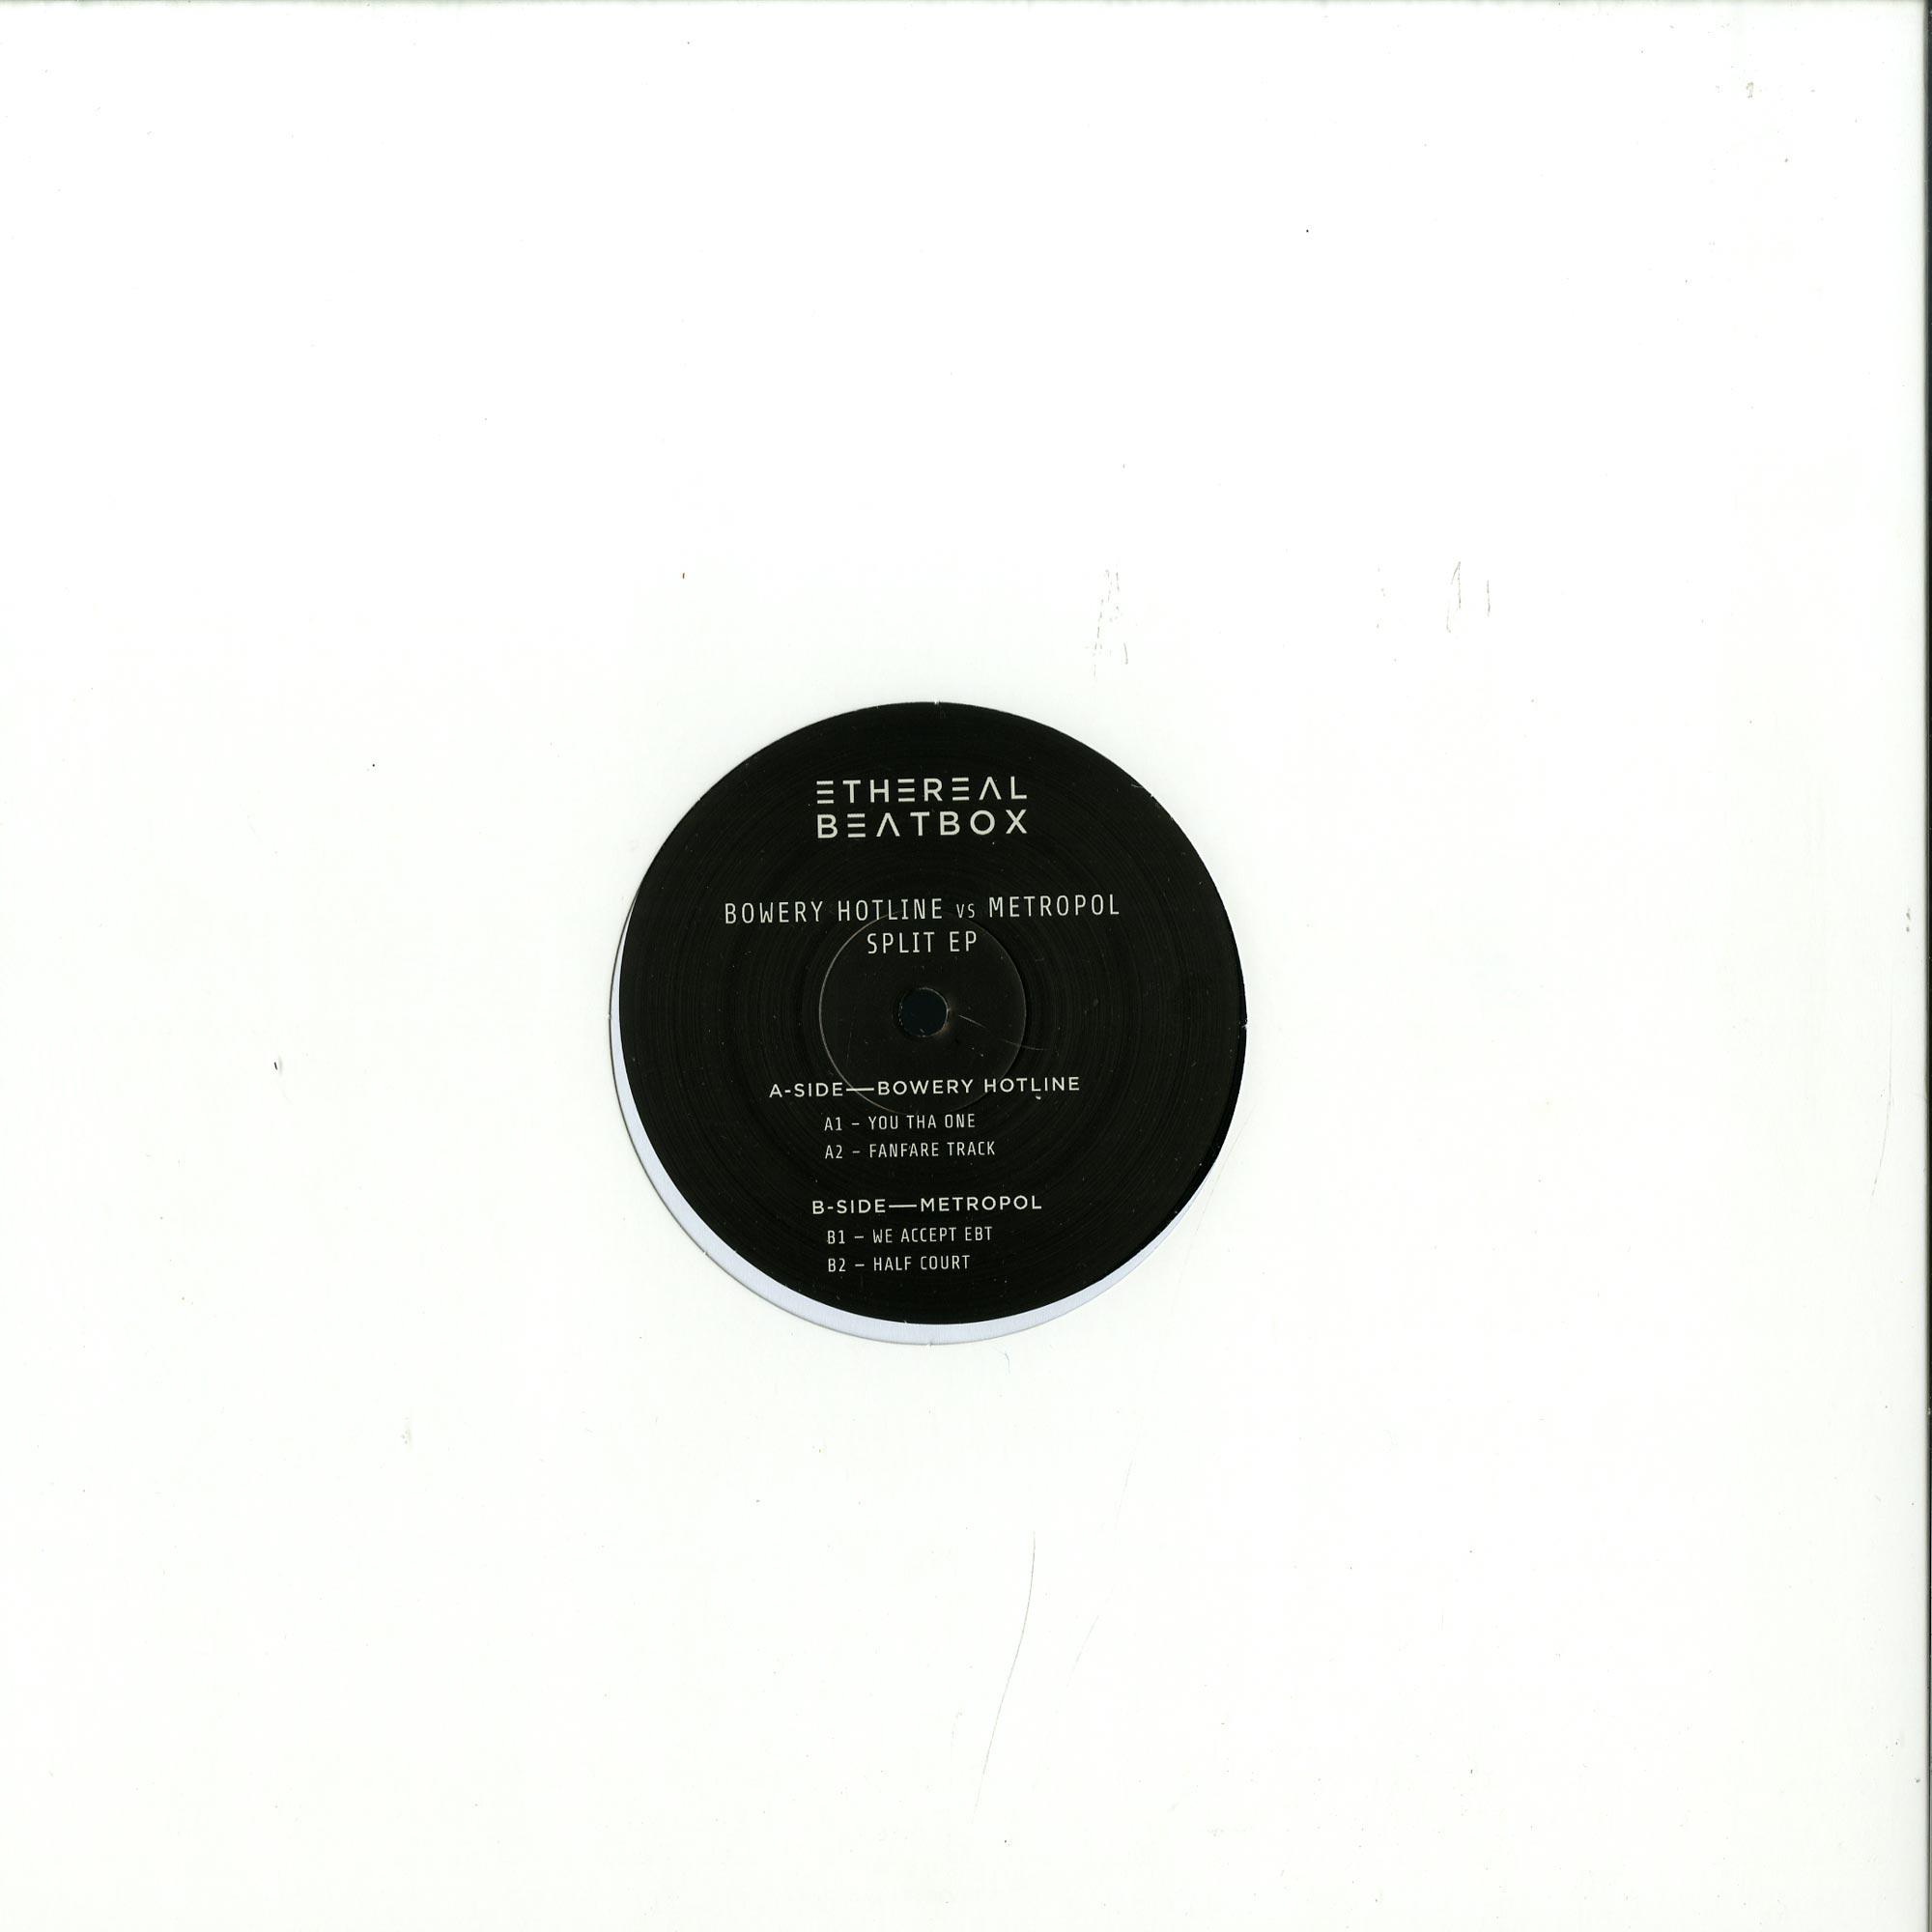 Bowery Hotline & Metropol - SPLIT EP